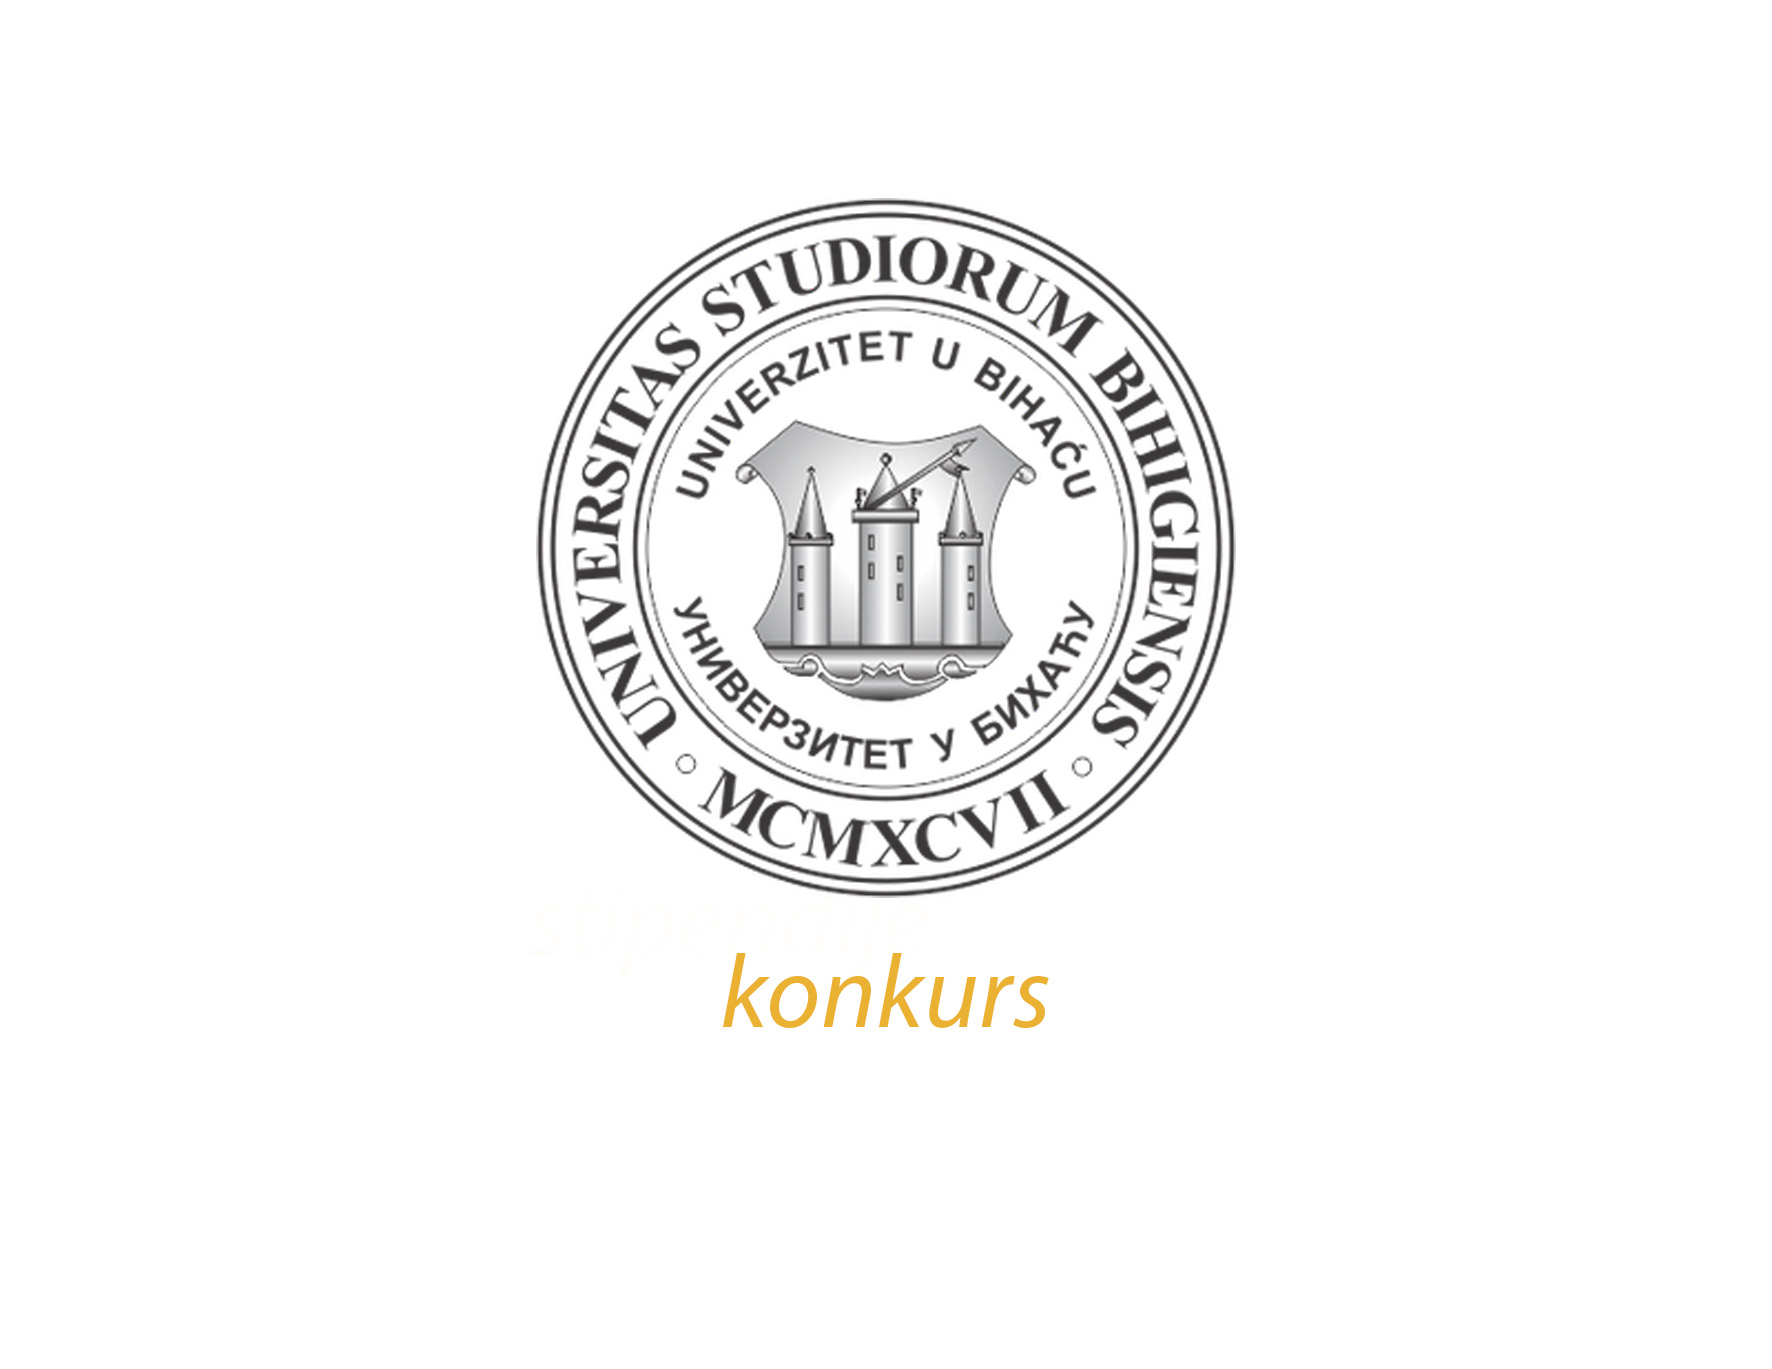 Konkurs Rektorata Univerziteta u Bihaću